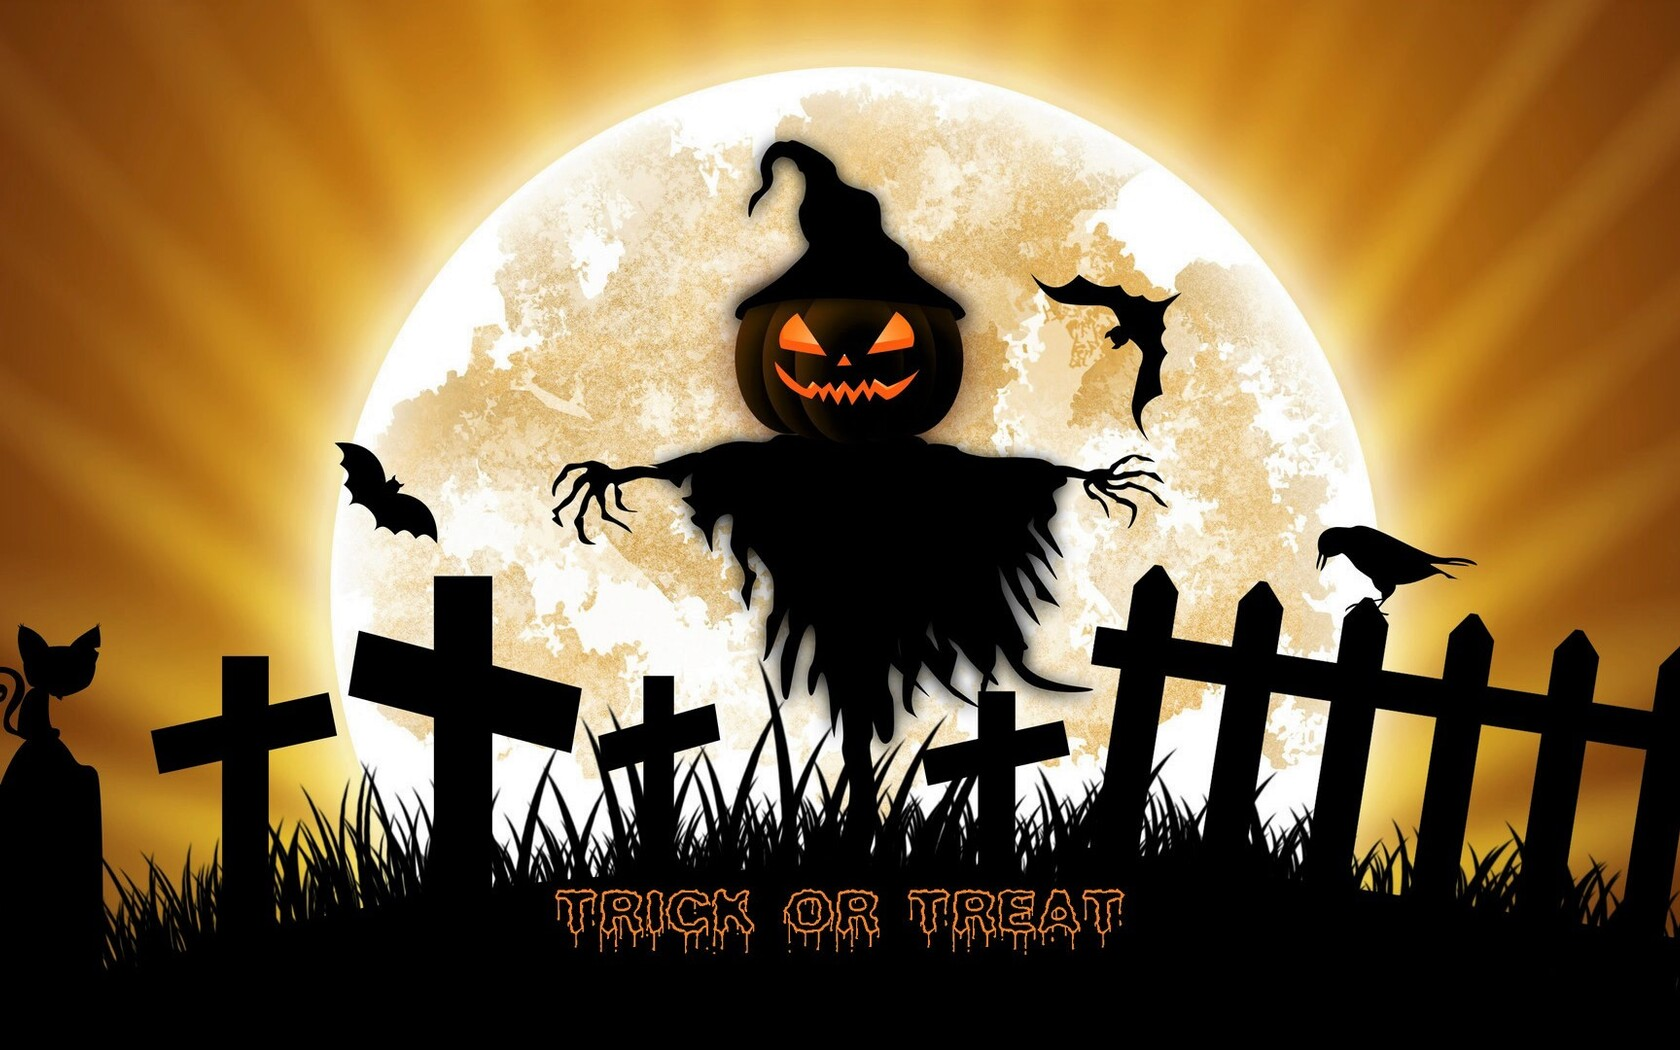 bat-fence-halloween-holiday-scarecrow-2t.jpg